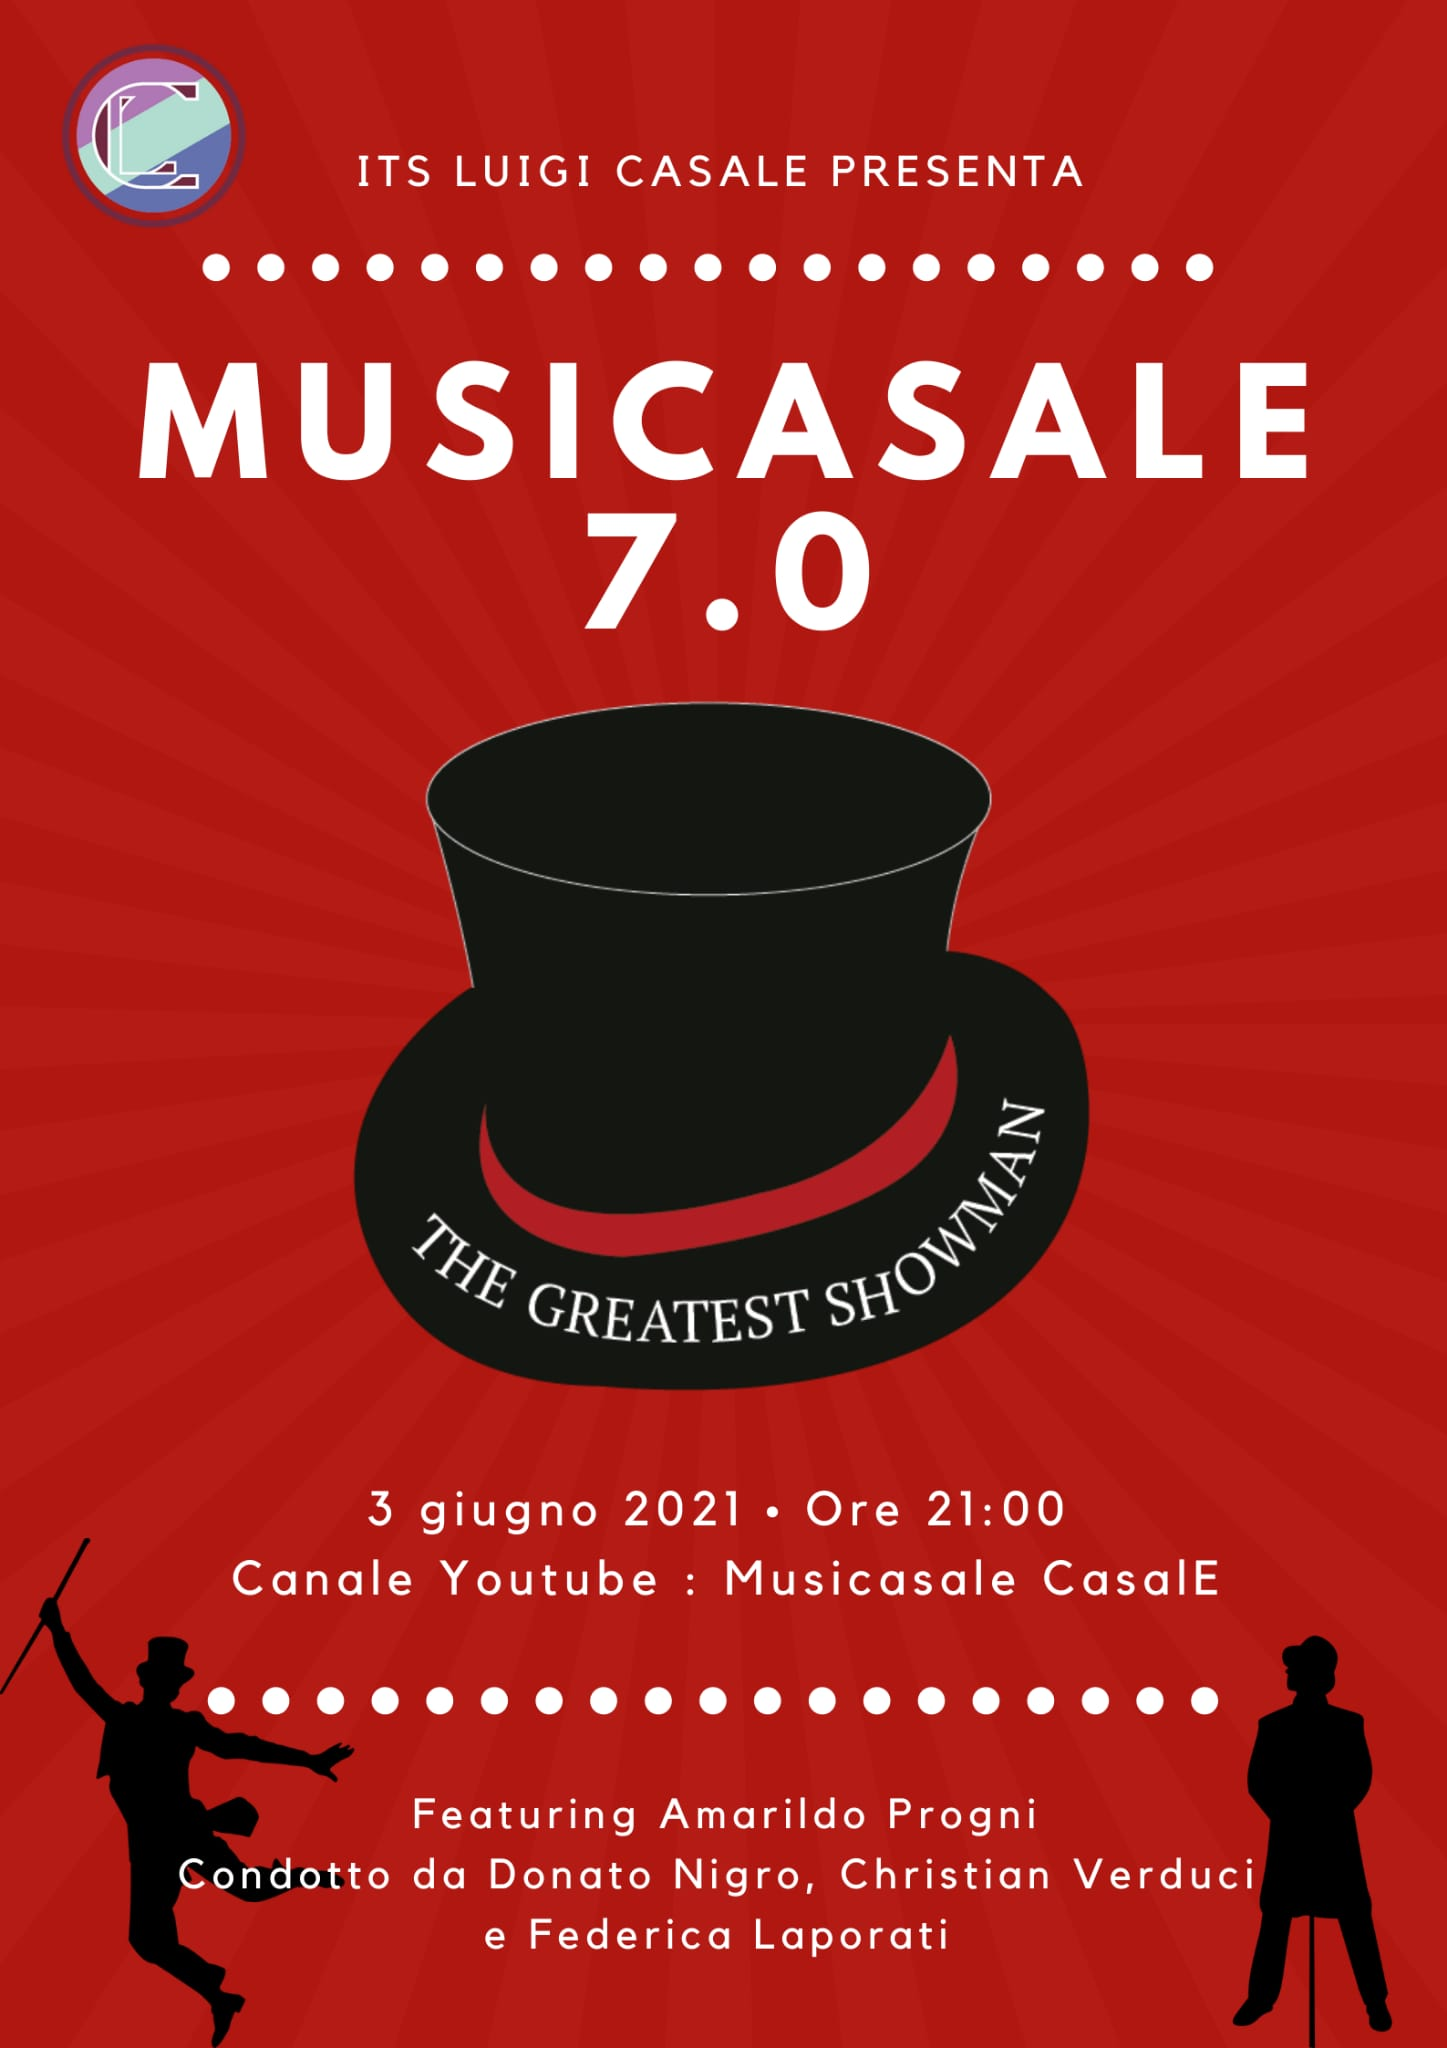 musicasale 7.0